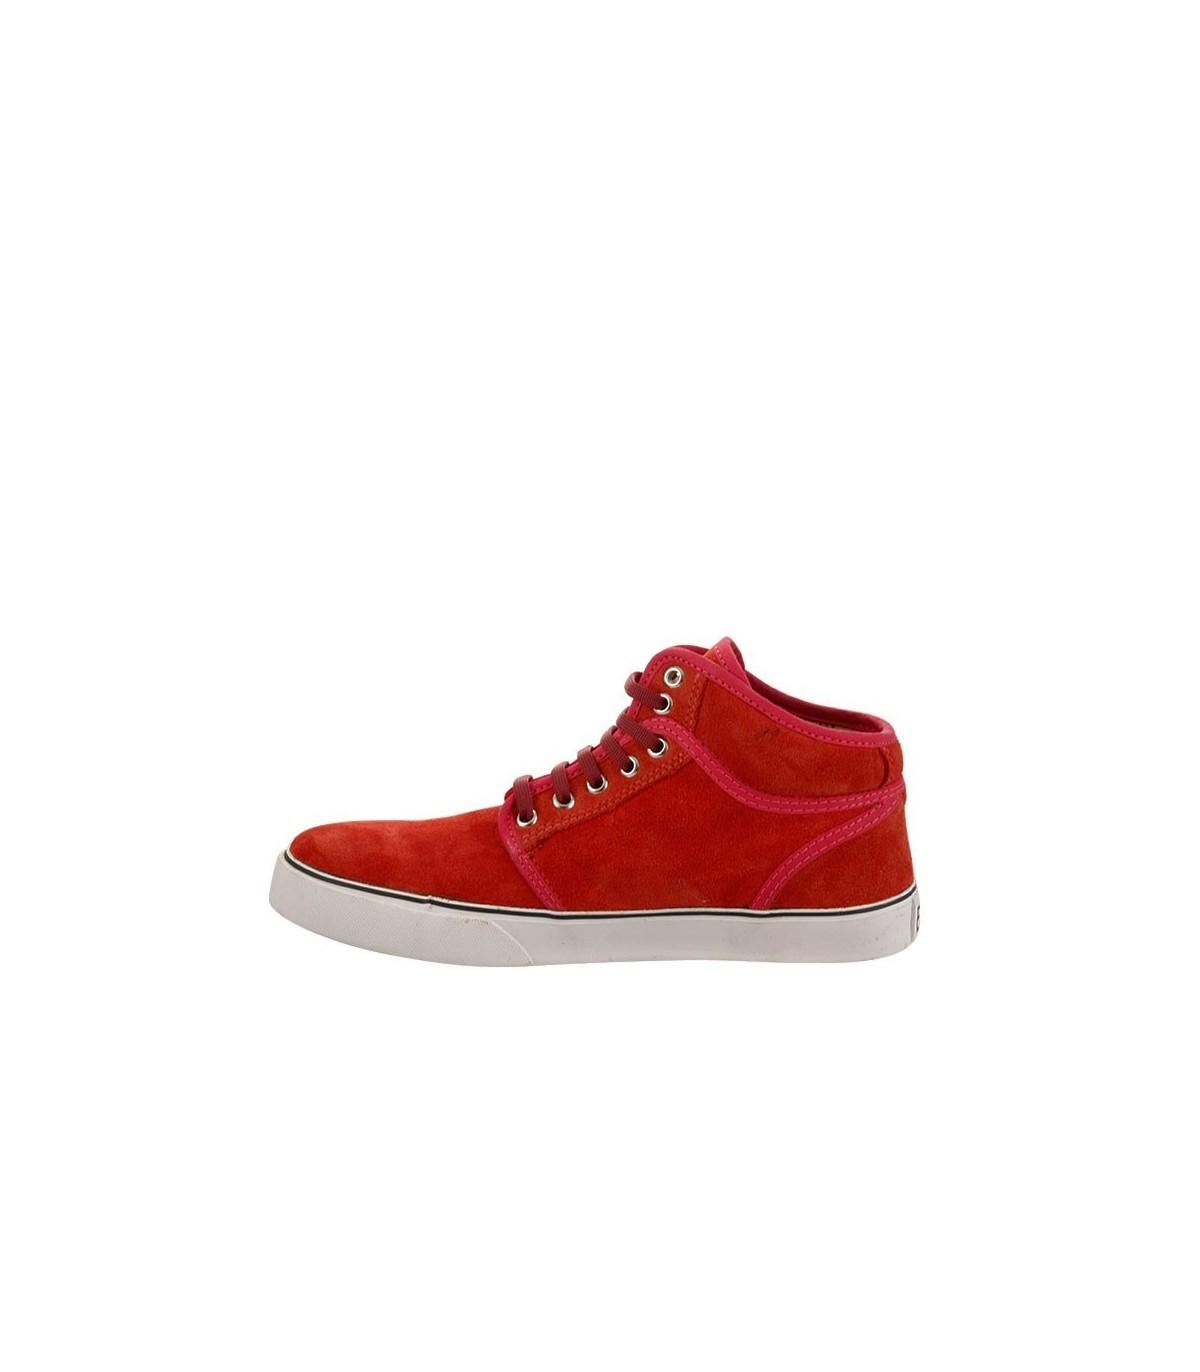 d507a20ce88 Zapatillas gamuzadas rojas